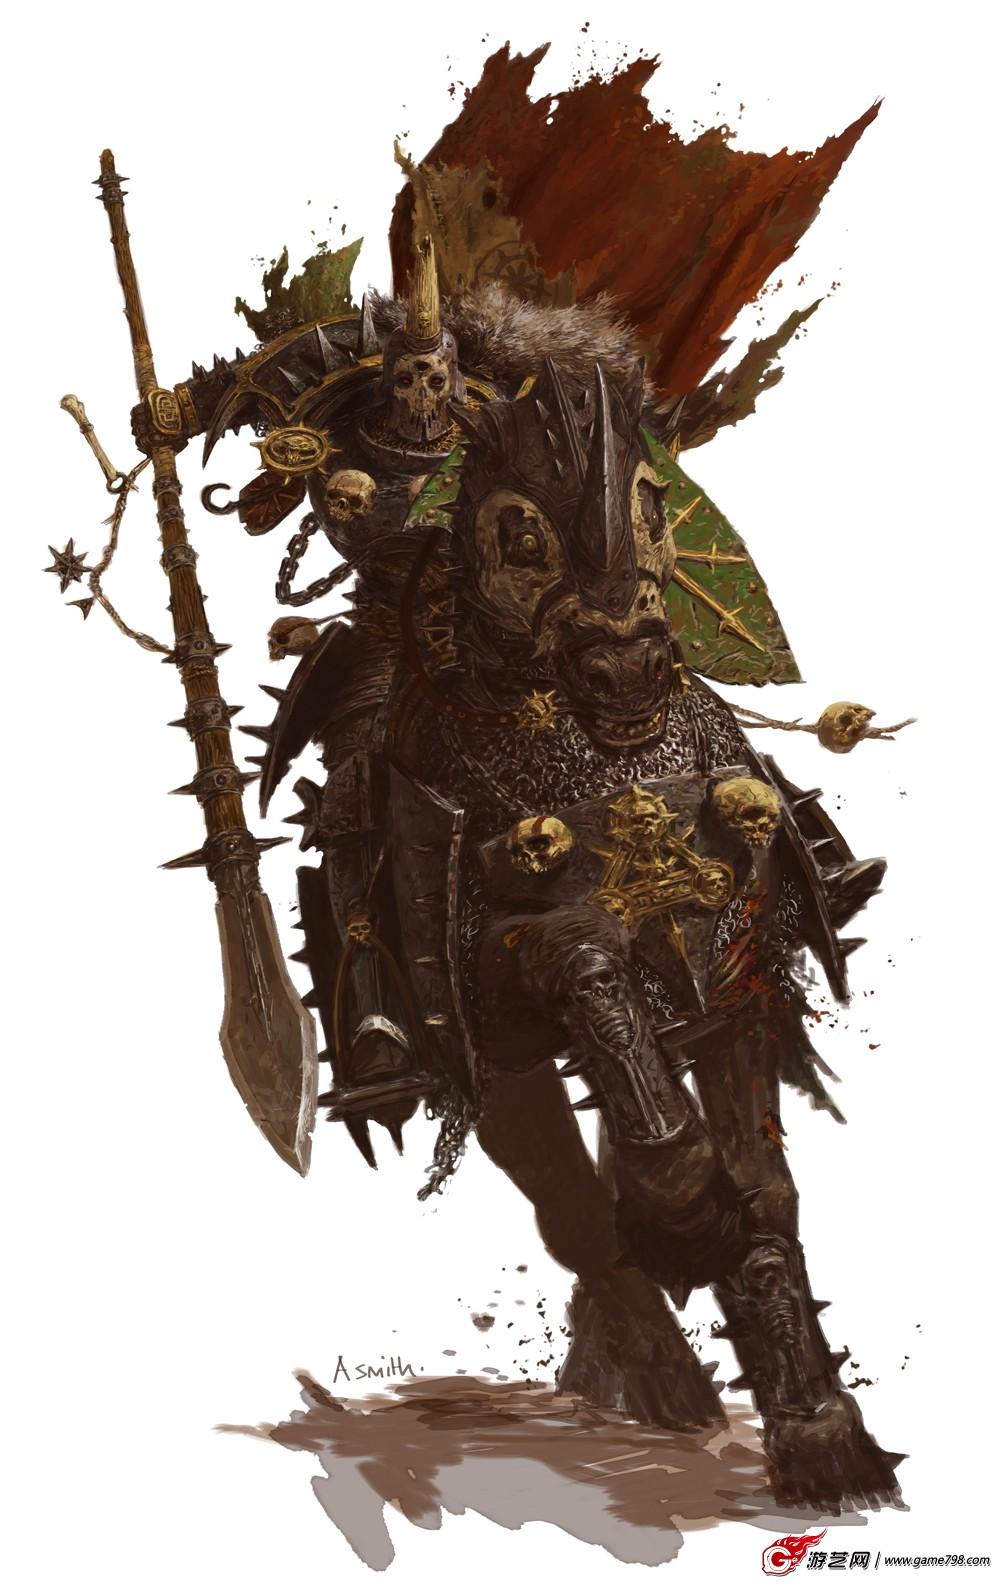 adrian-smith-nurgle-knight-forgeworld-gw.jpg